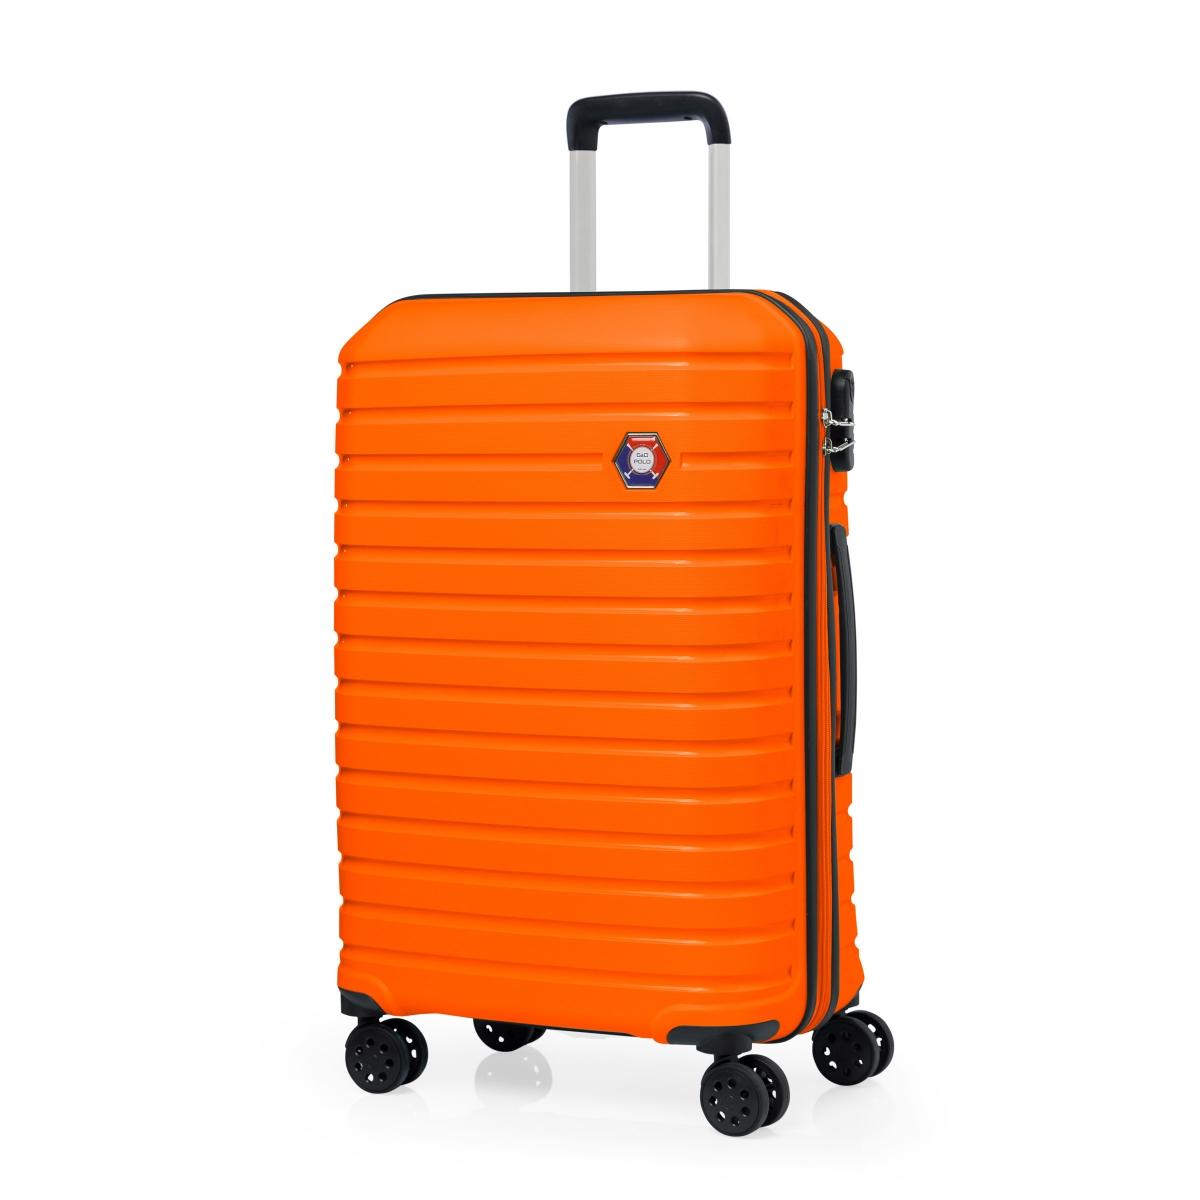 G&D Polo Suitcase PP Enjeksiyon 3'lü Valiz Seyahat Seti - Model 400.15 Turuncu